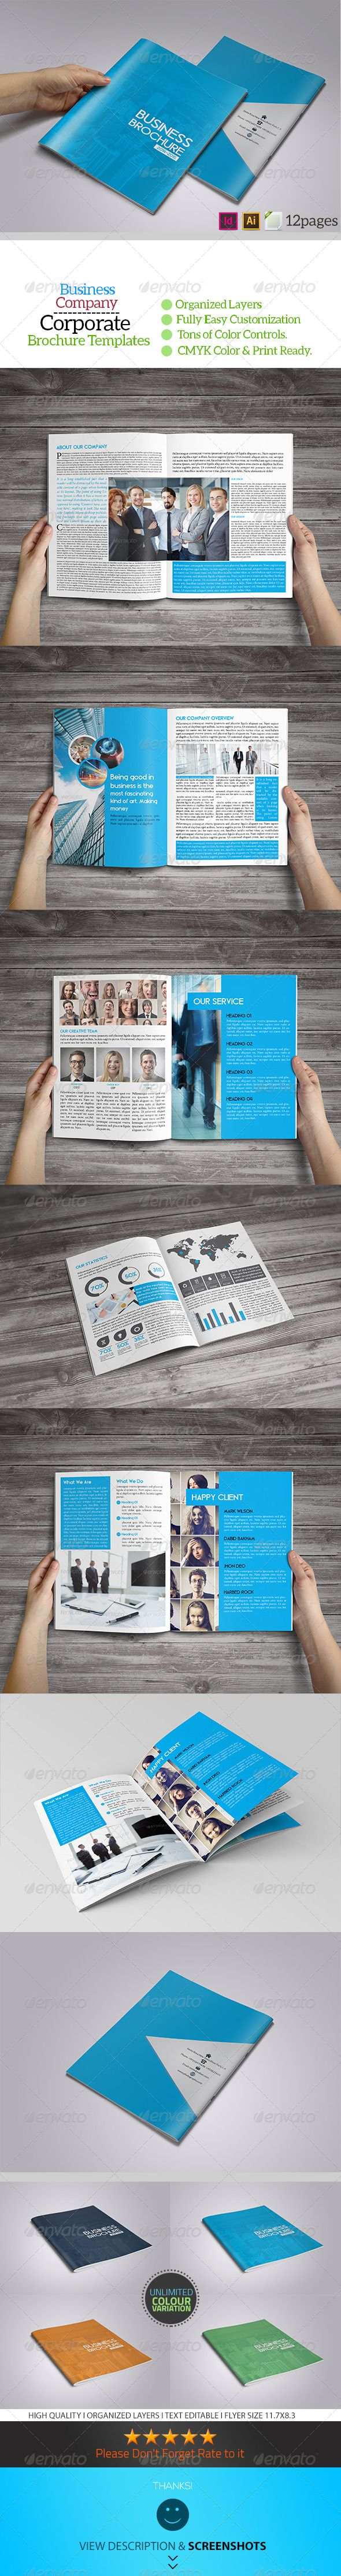 12 Page Business Brochure Template Pinterest Brochure Template